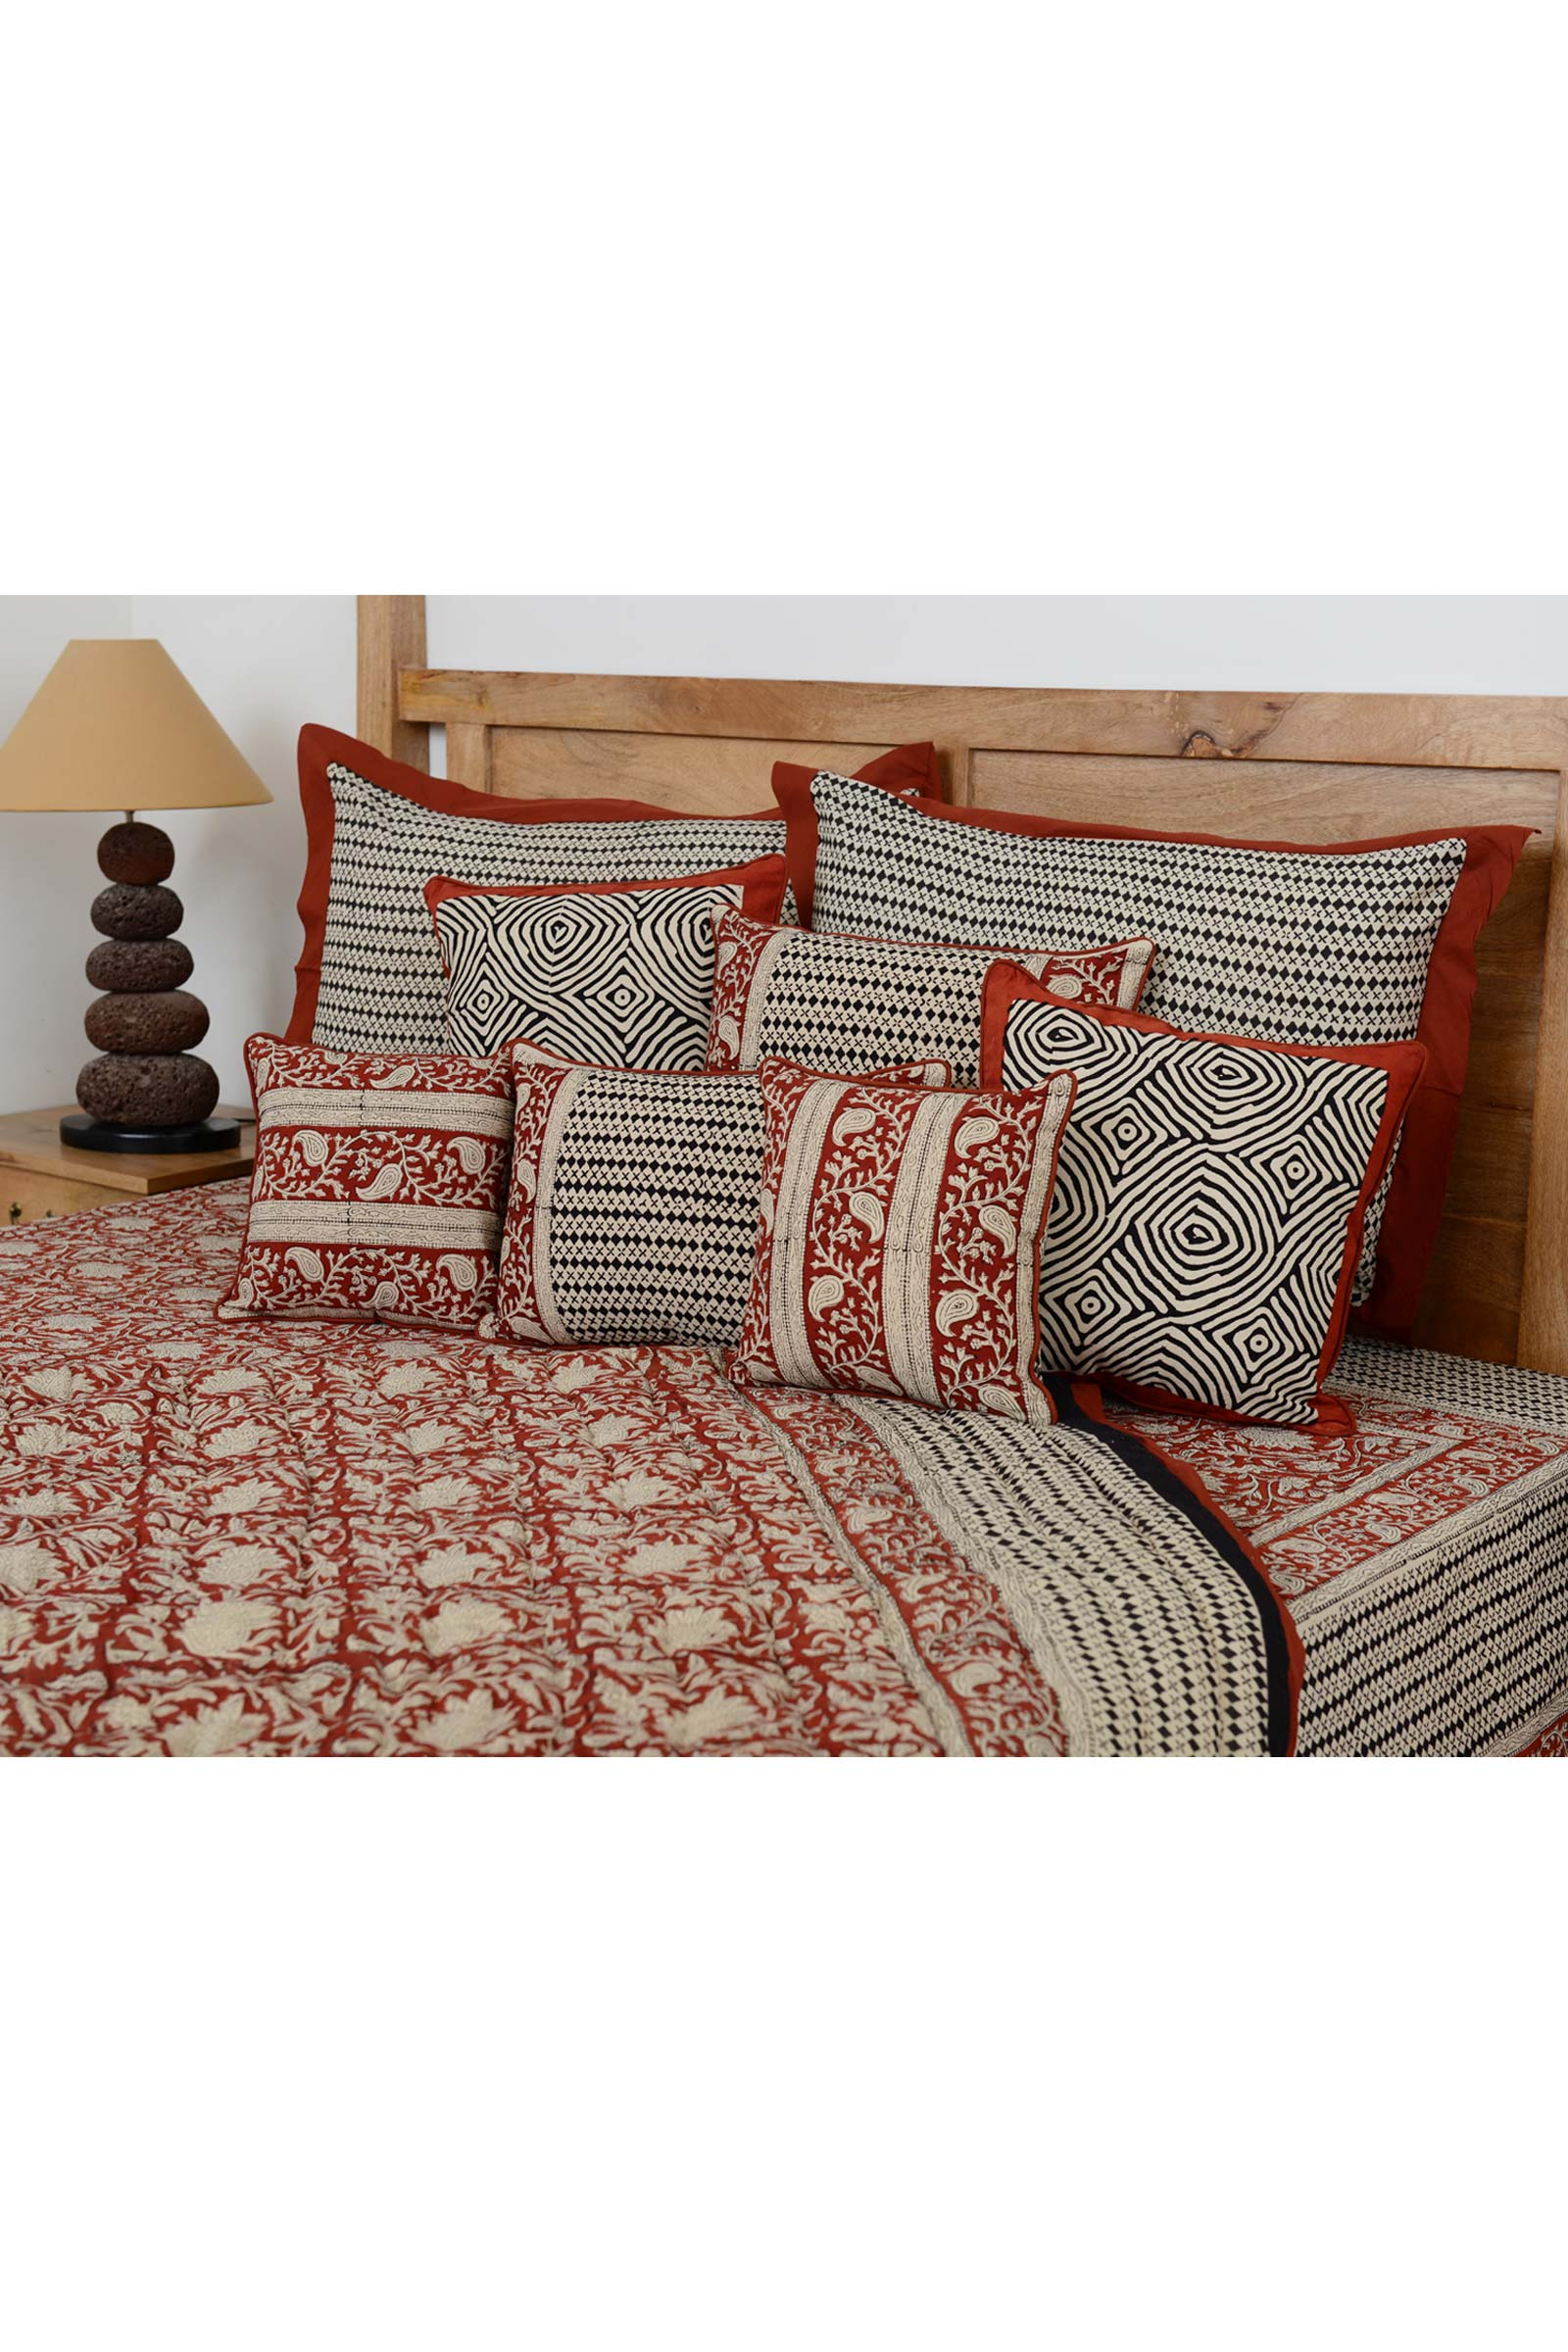 Vrindavan Bed Cover